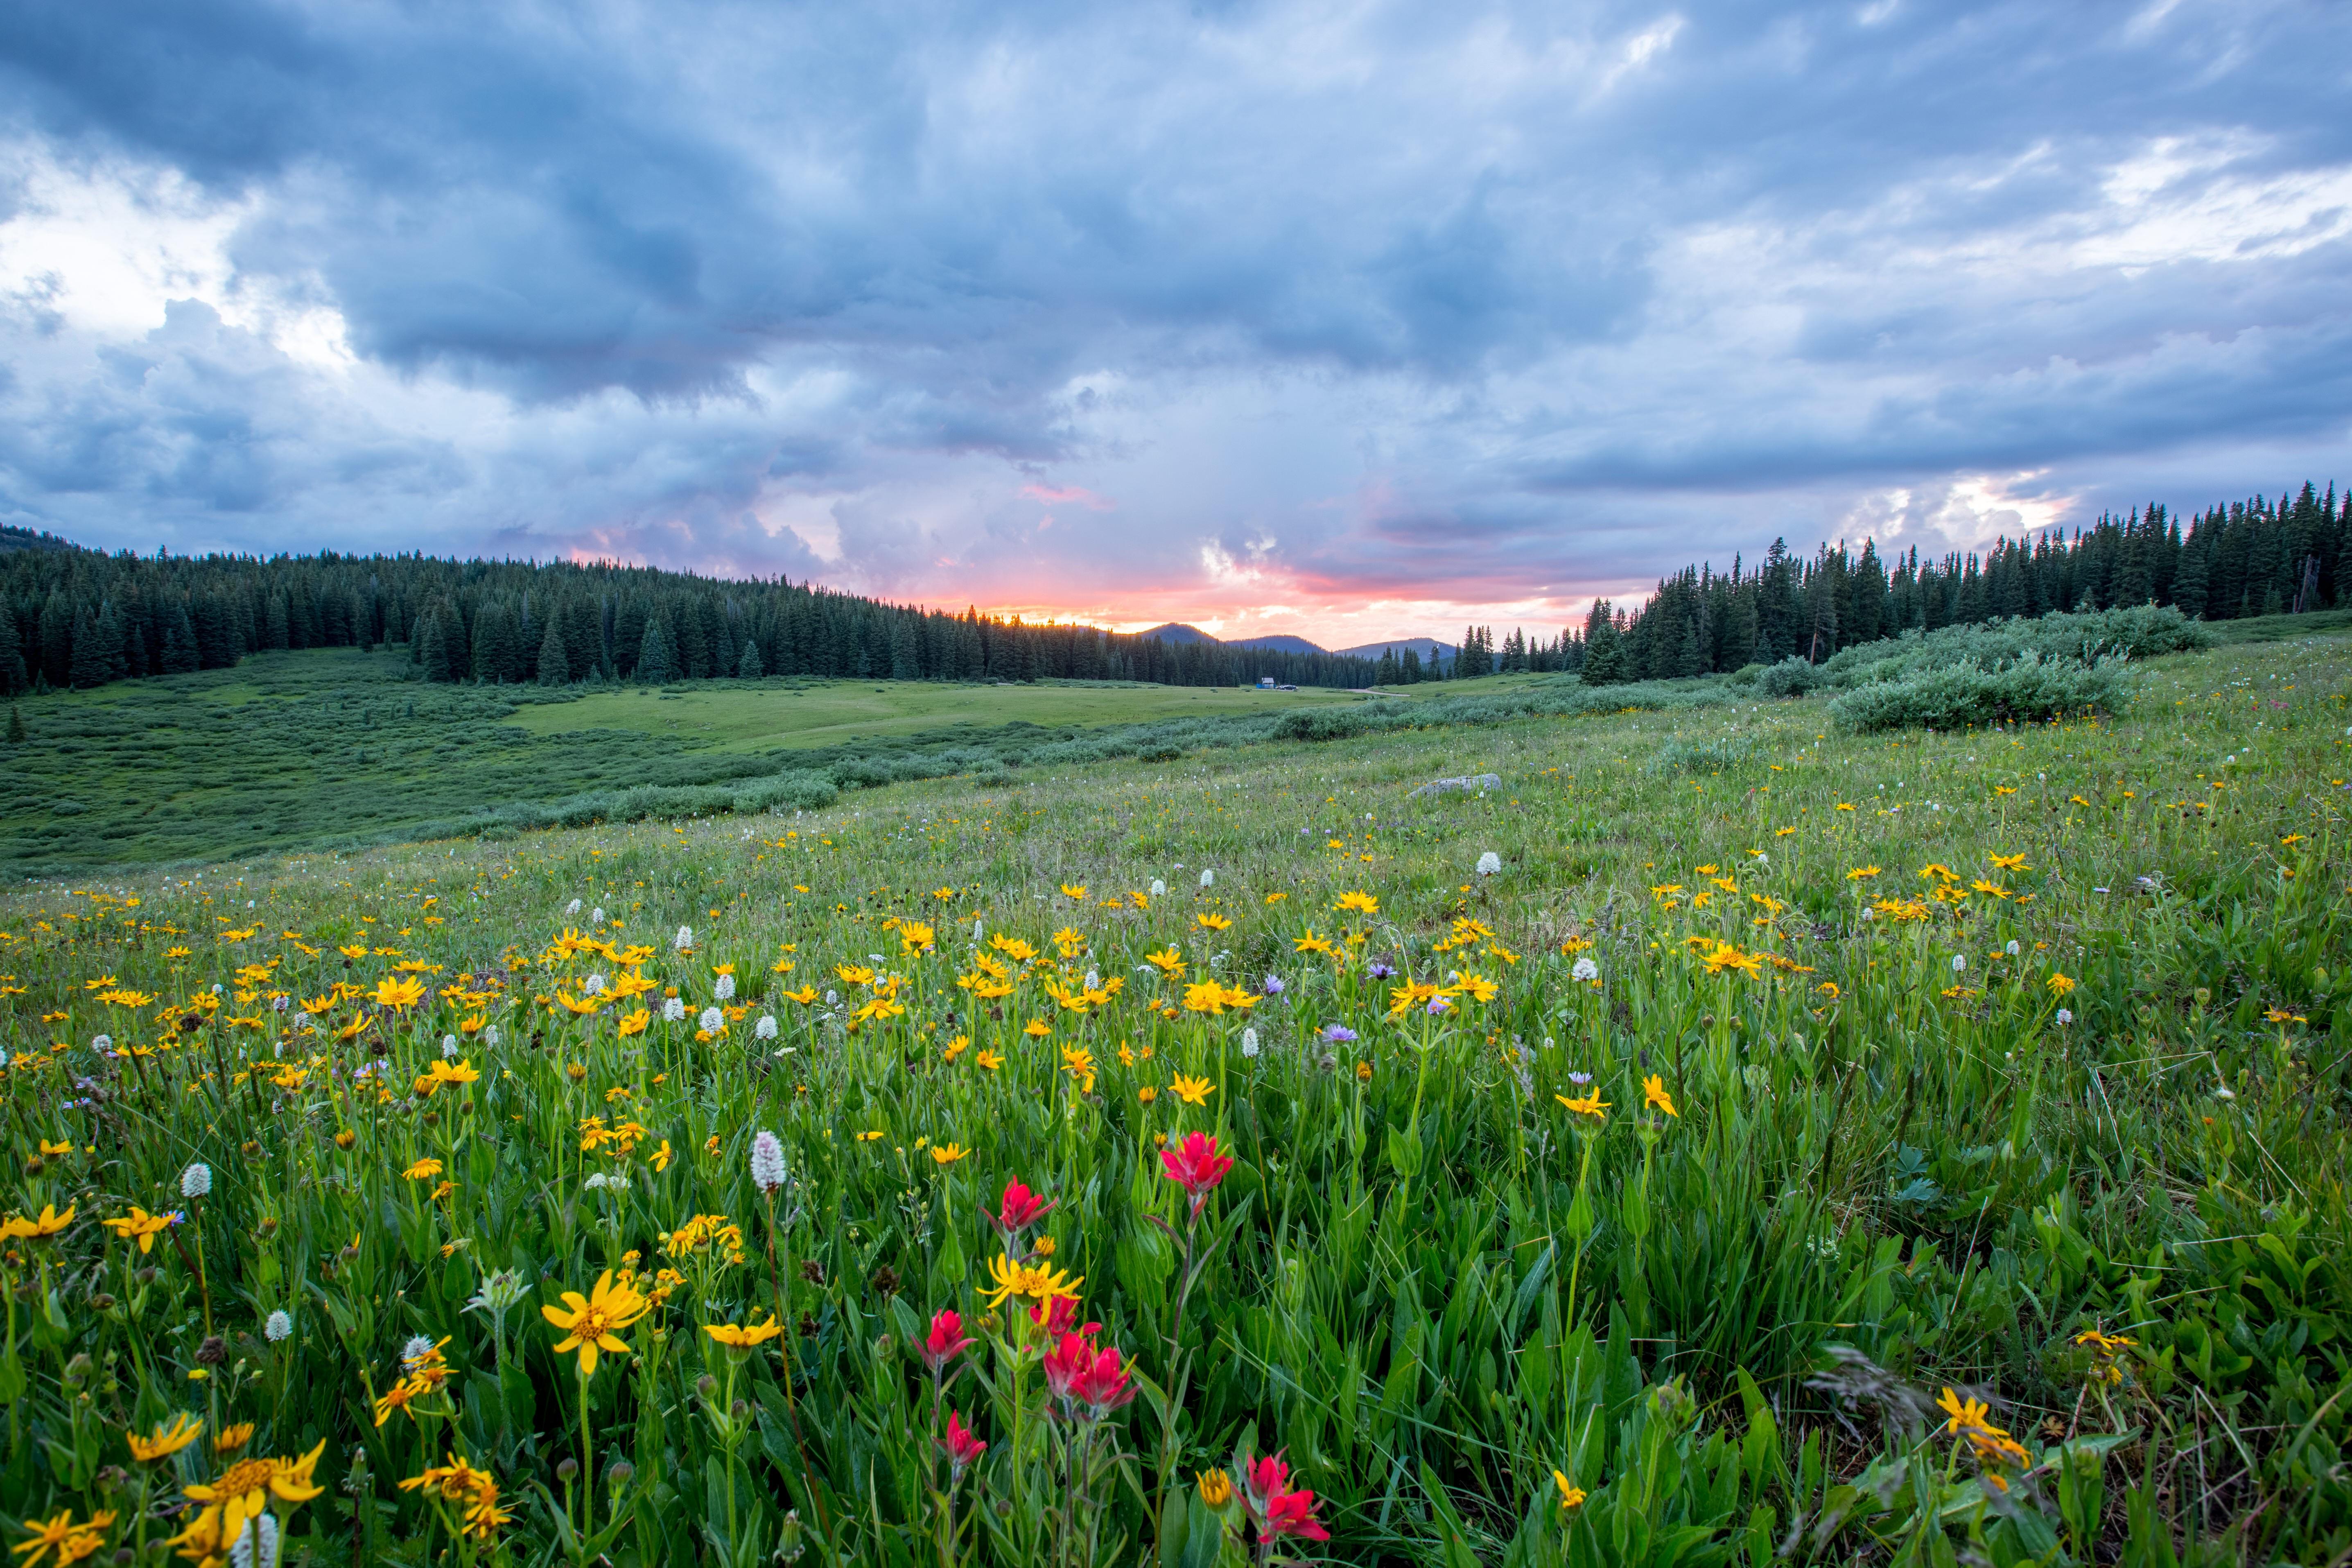 Free Images : Landscape, Nature, Forest, Wilderness